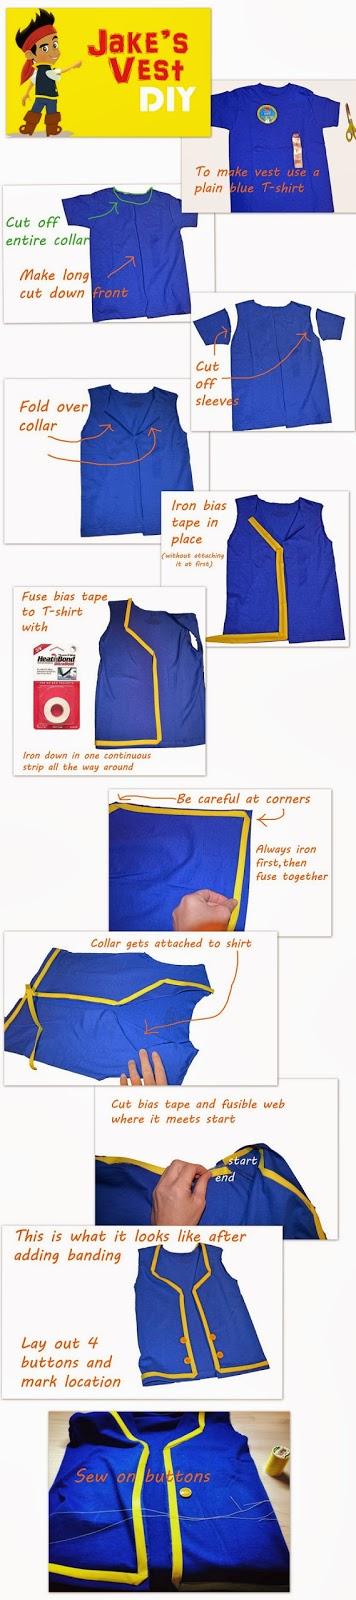 Disneyu0027s Jake and the Neverland Pirates DIY Jakeu0027s Vest Tutorial  sc 1 st  Smart Girls DIY & DIY Jake and the Never Land Pirates Costume